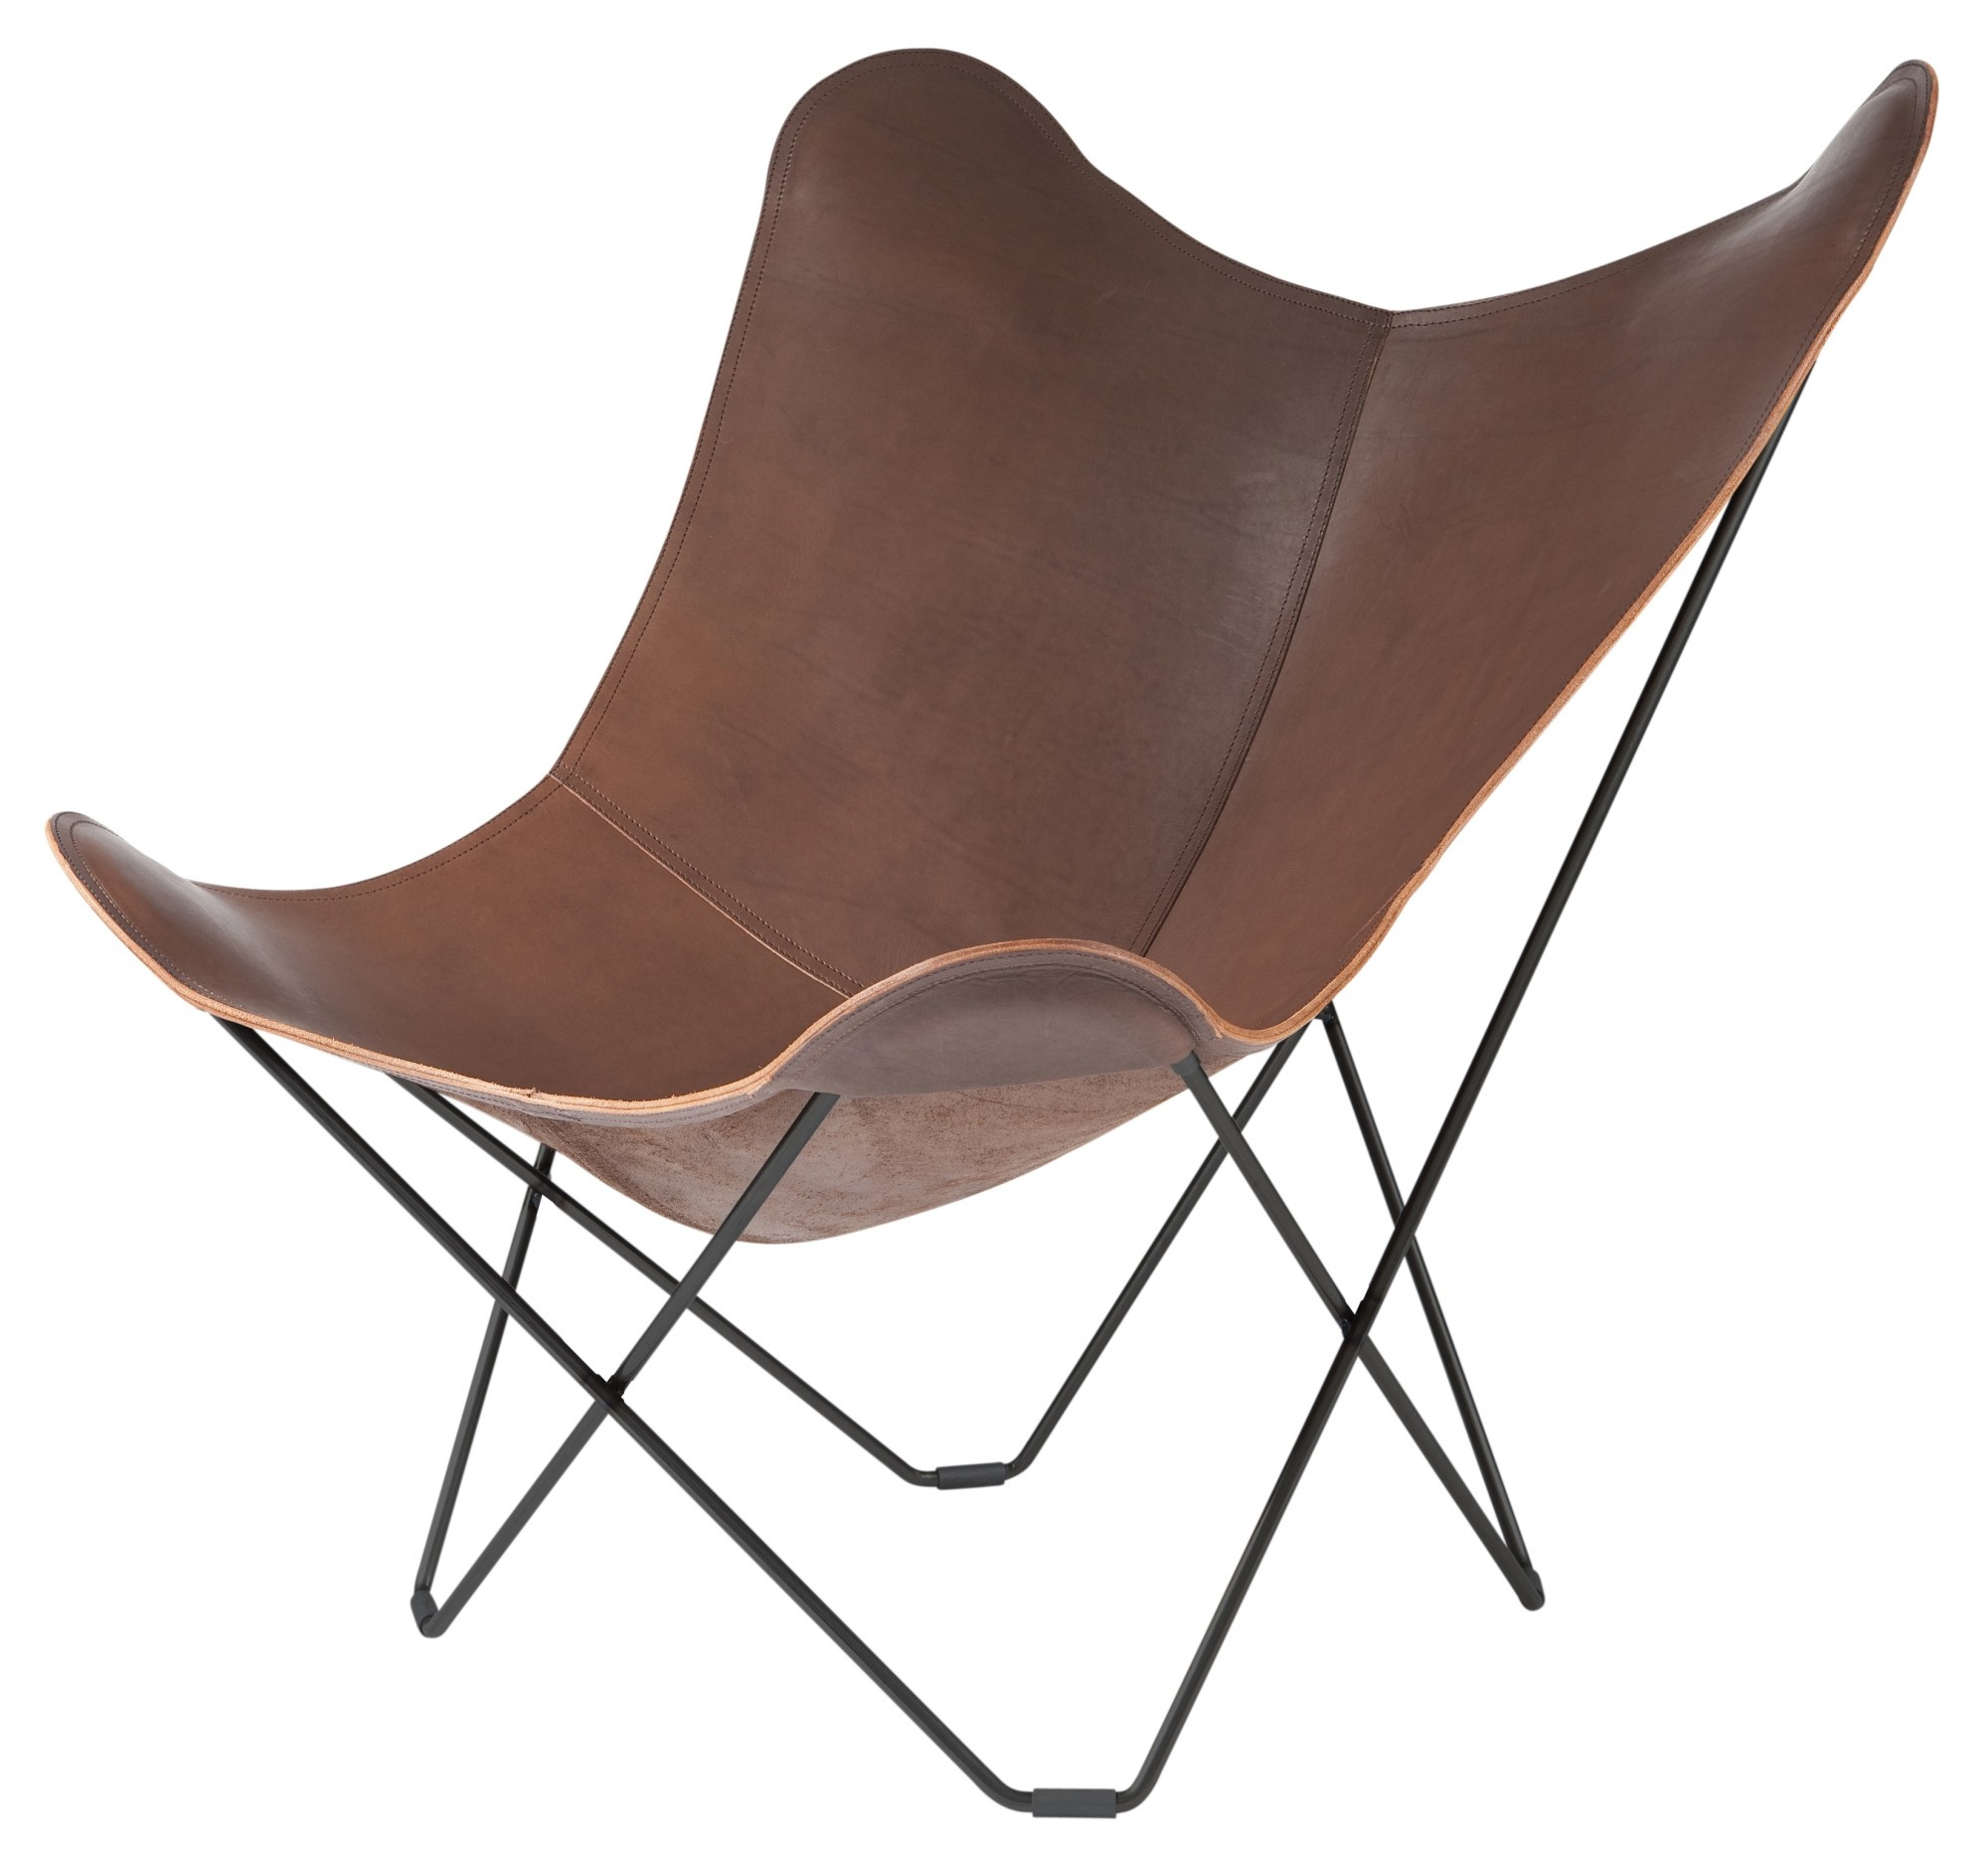 cuero pampa mariposa chair. Black Bedroom Furniture Sets. Home Design Ideas